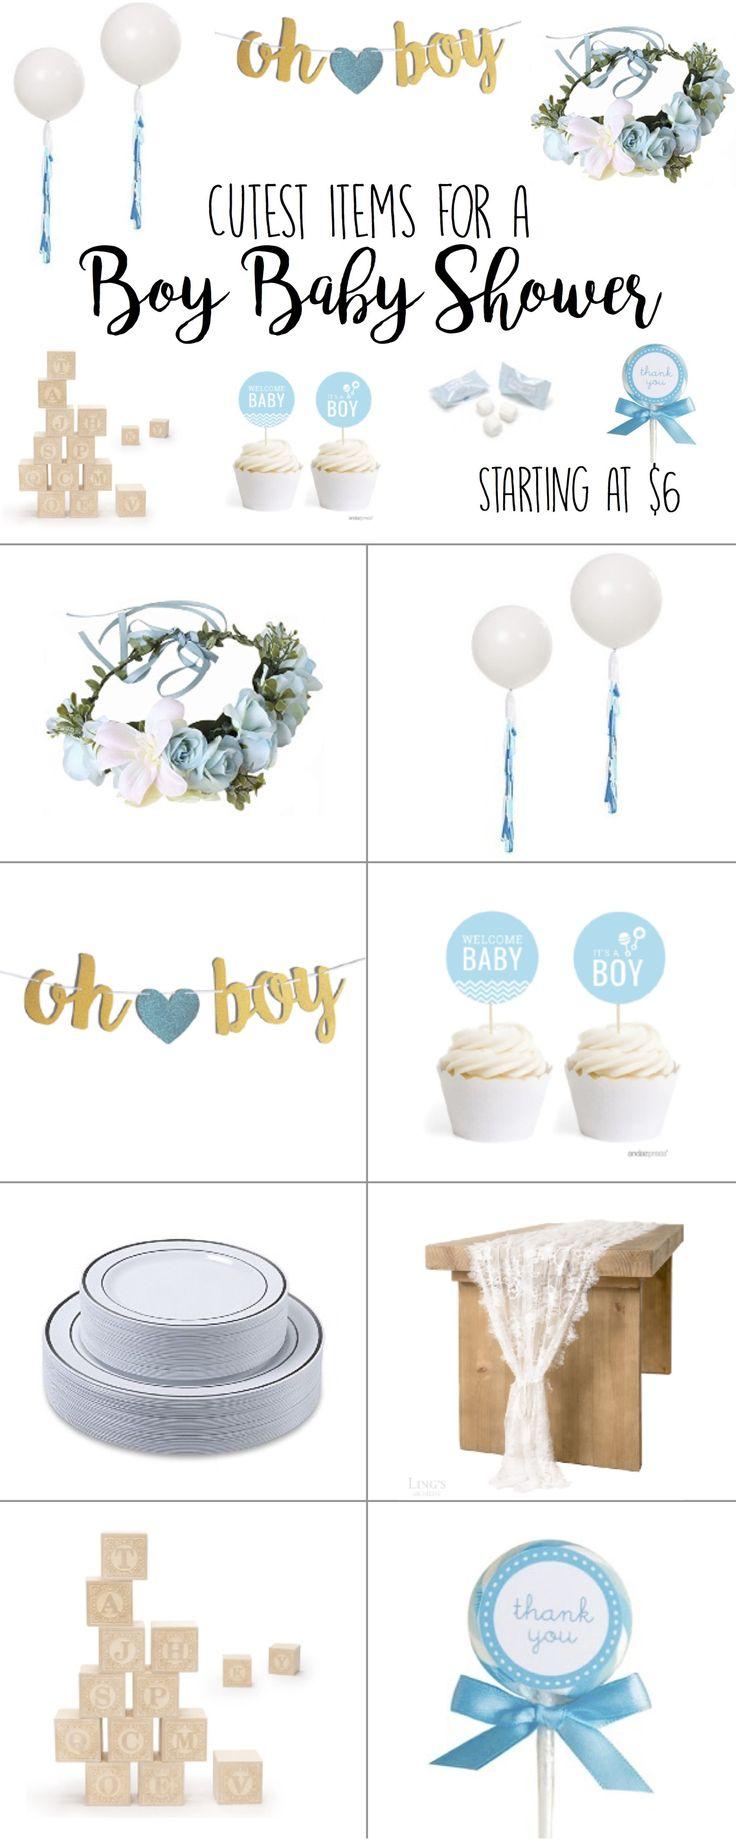 Boy Baby Shower Ideas, decorations. theme, games, food, themes, decorations, favors, invitations, gifts, centerpieces, cakes, brunch, activities, elephant, boho, rustic, twinkle twinkle little star, dIY, invites, desserts, little man, blue,